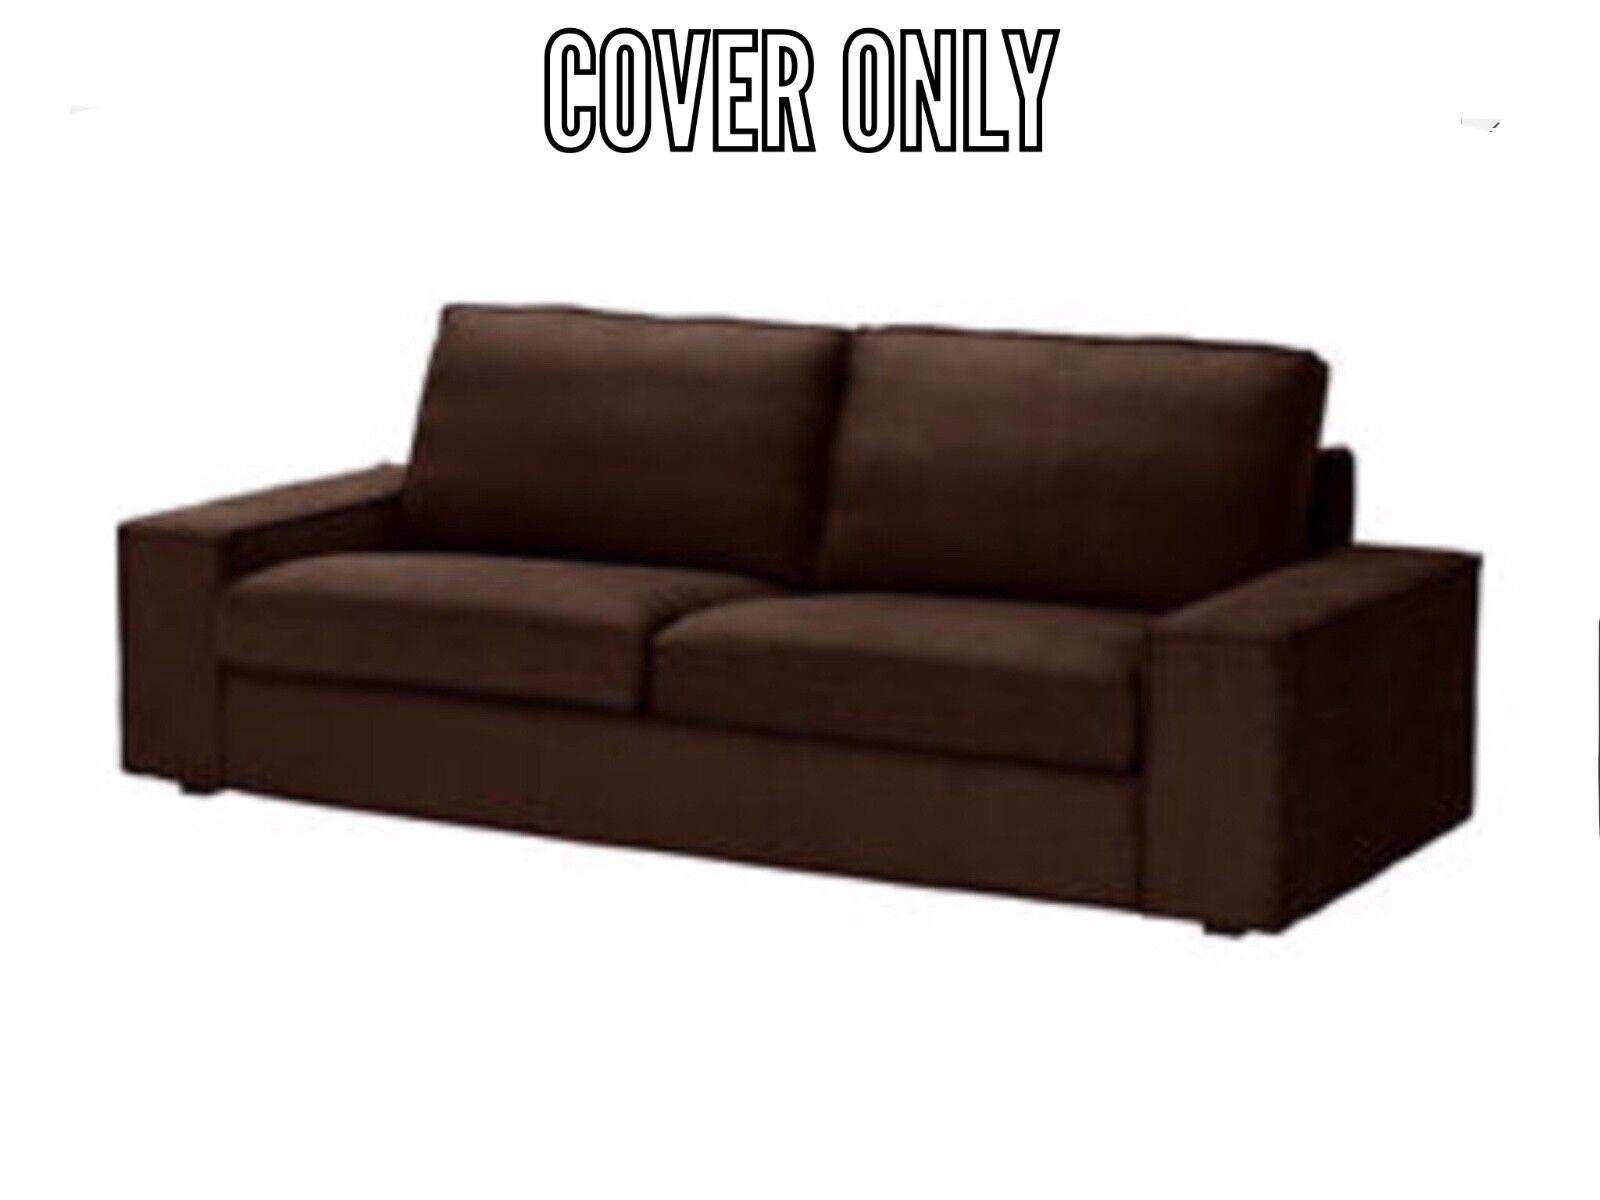 Ikea Kivik 3 Seat Sofa Cover Only Tullinge Dark Brown Slipcover 00200358